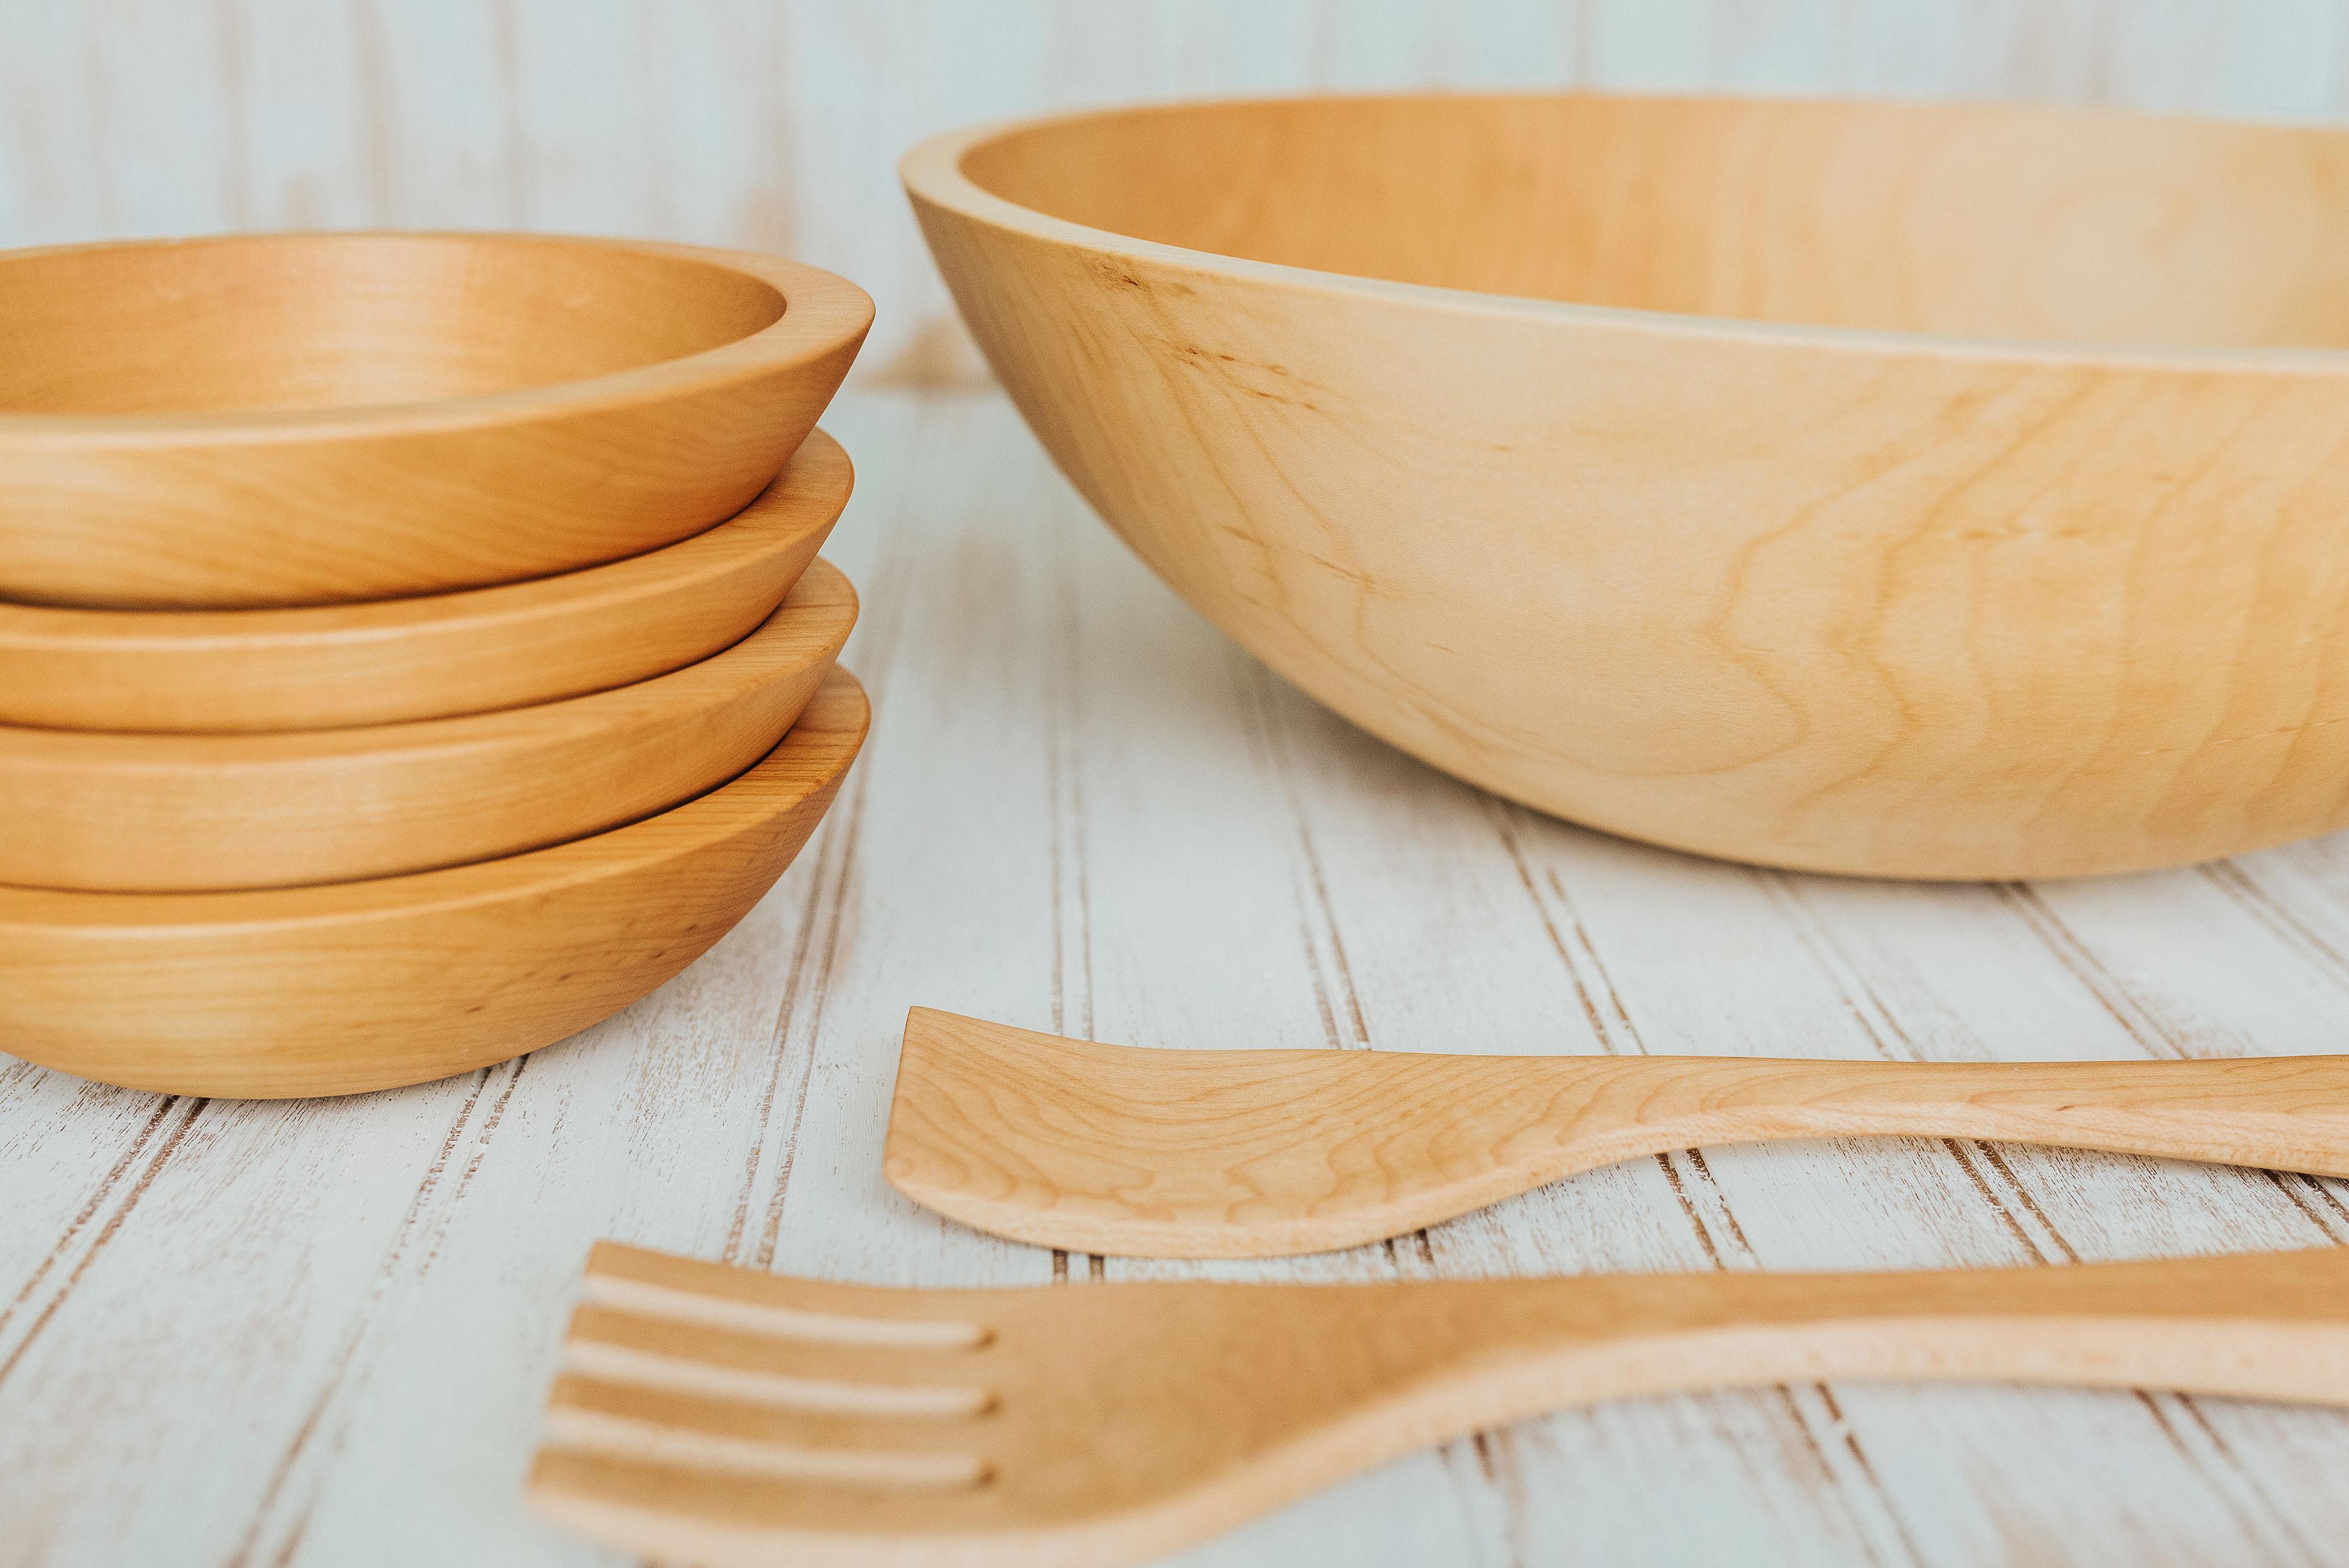 17 Inch Maple Wood Salad Bowl Set Wood Salad Bowl Set